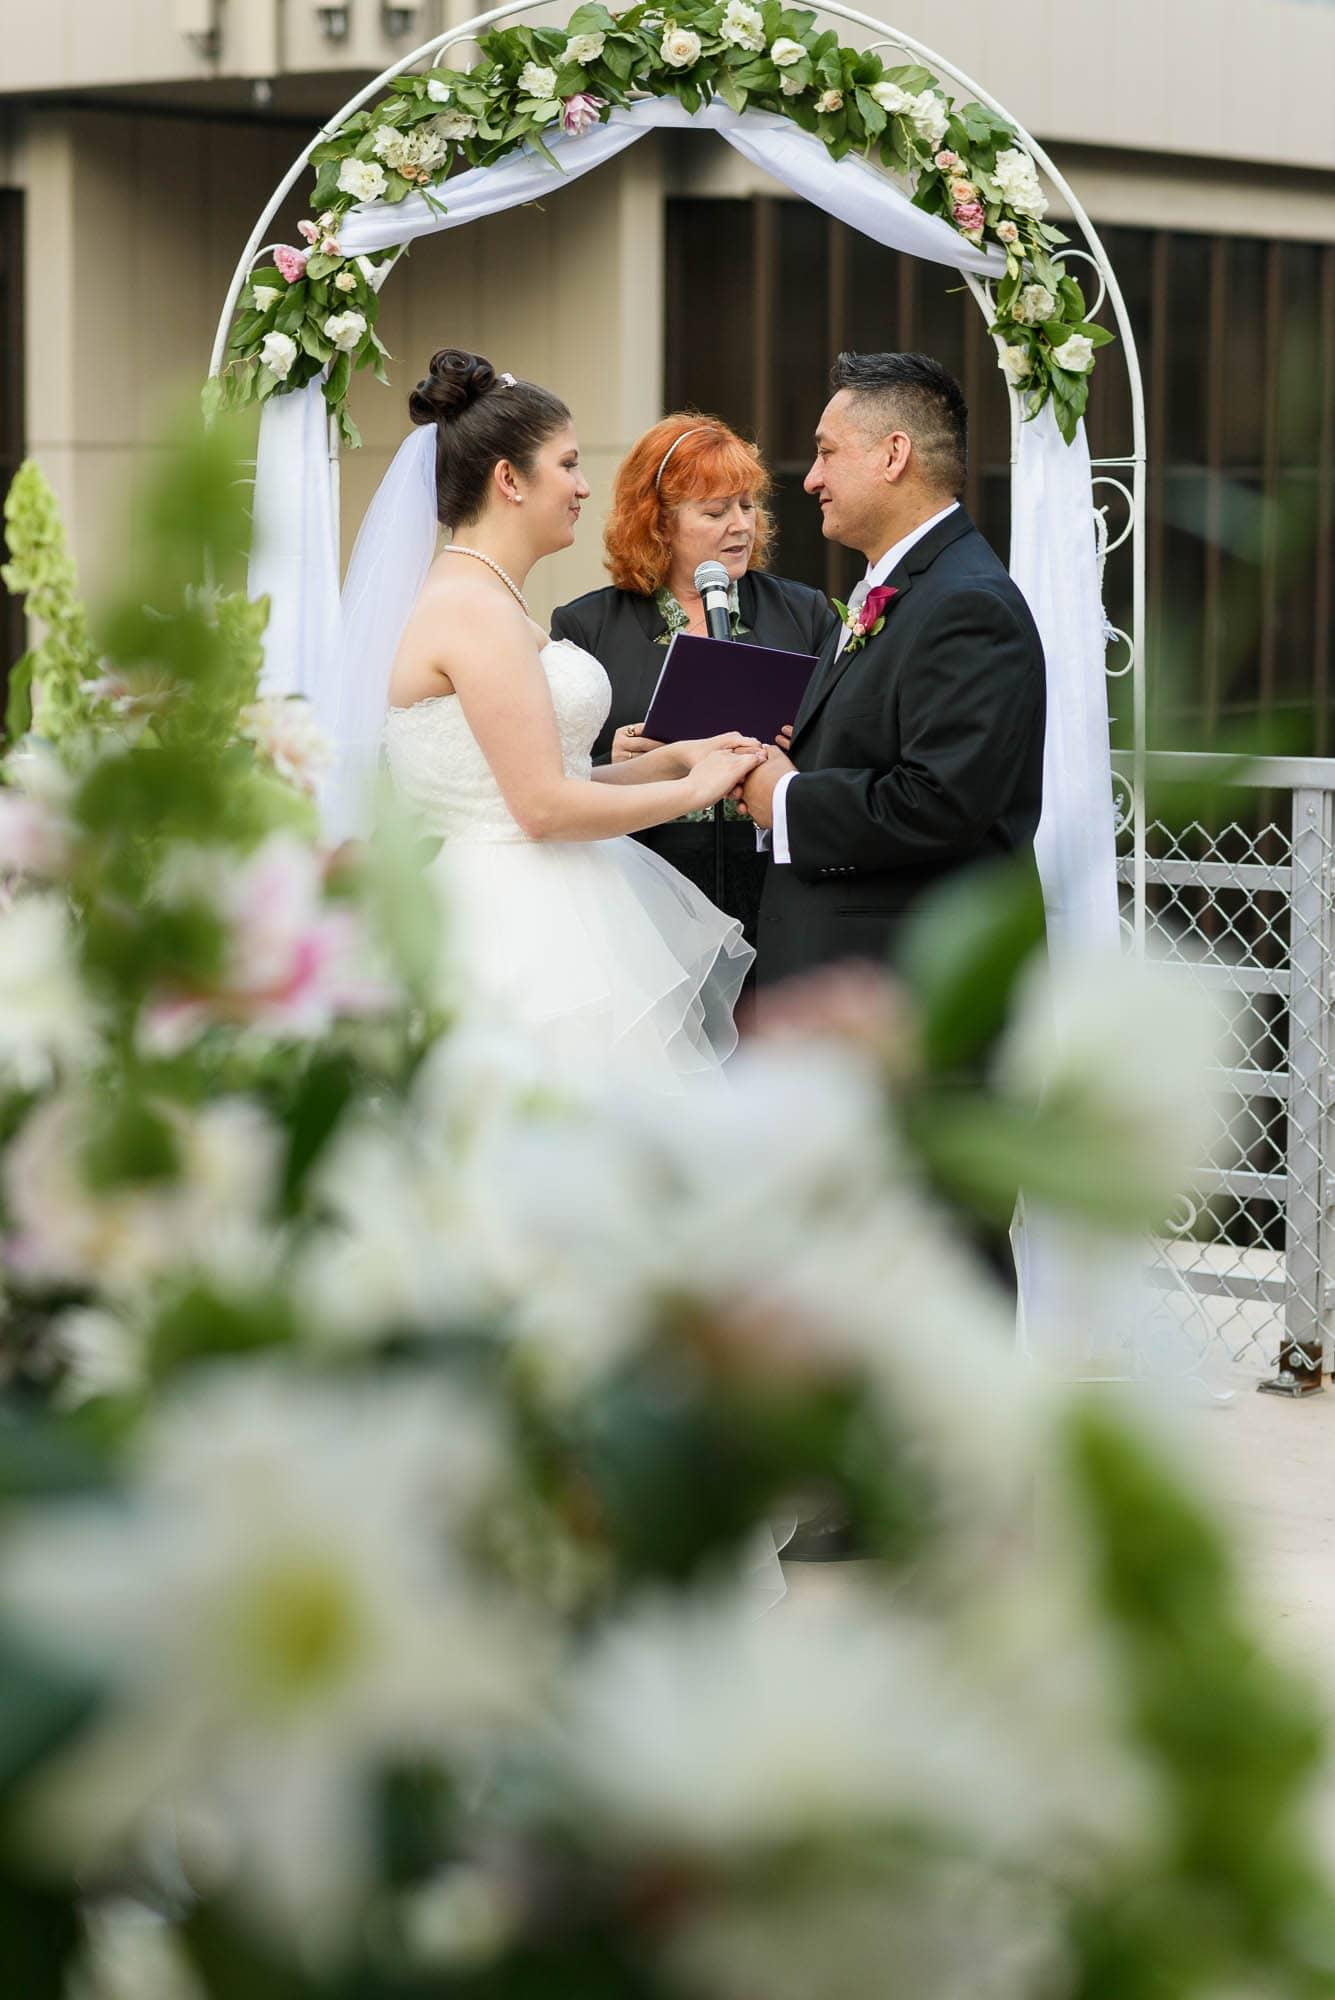 021_Alan_and_Heidi_Wedding_Nicole_Roman